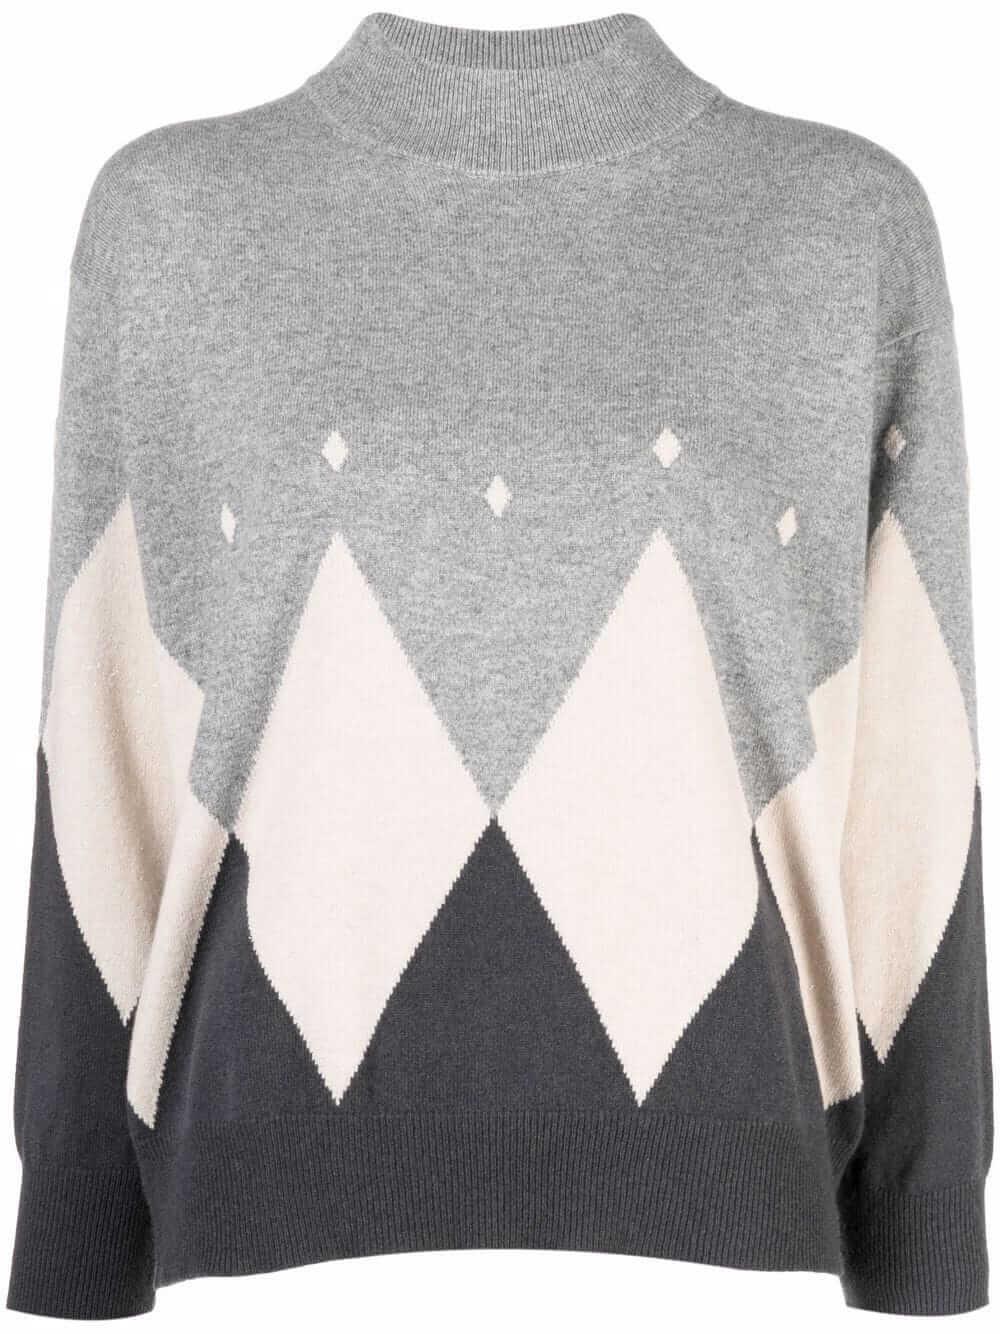 Argyle Sweater Item # S99092F12